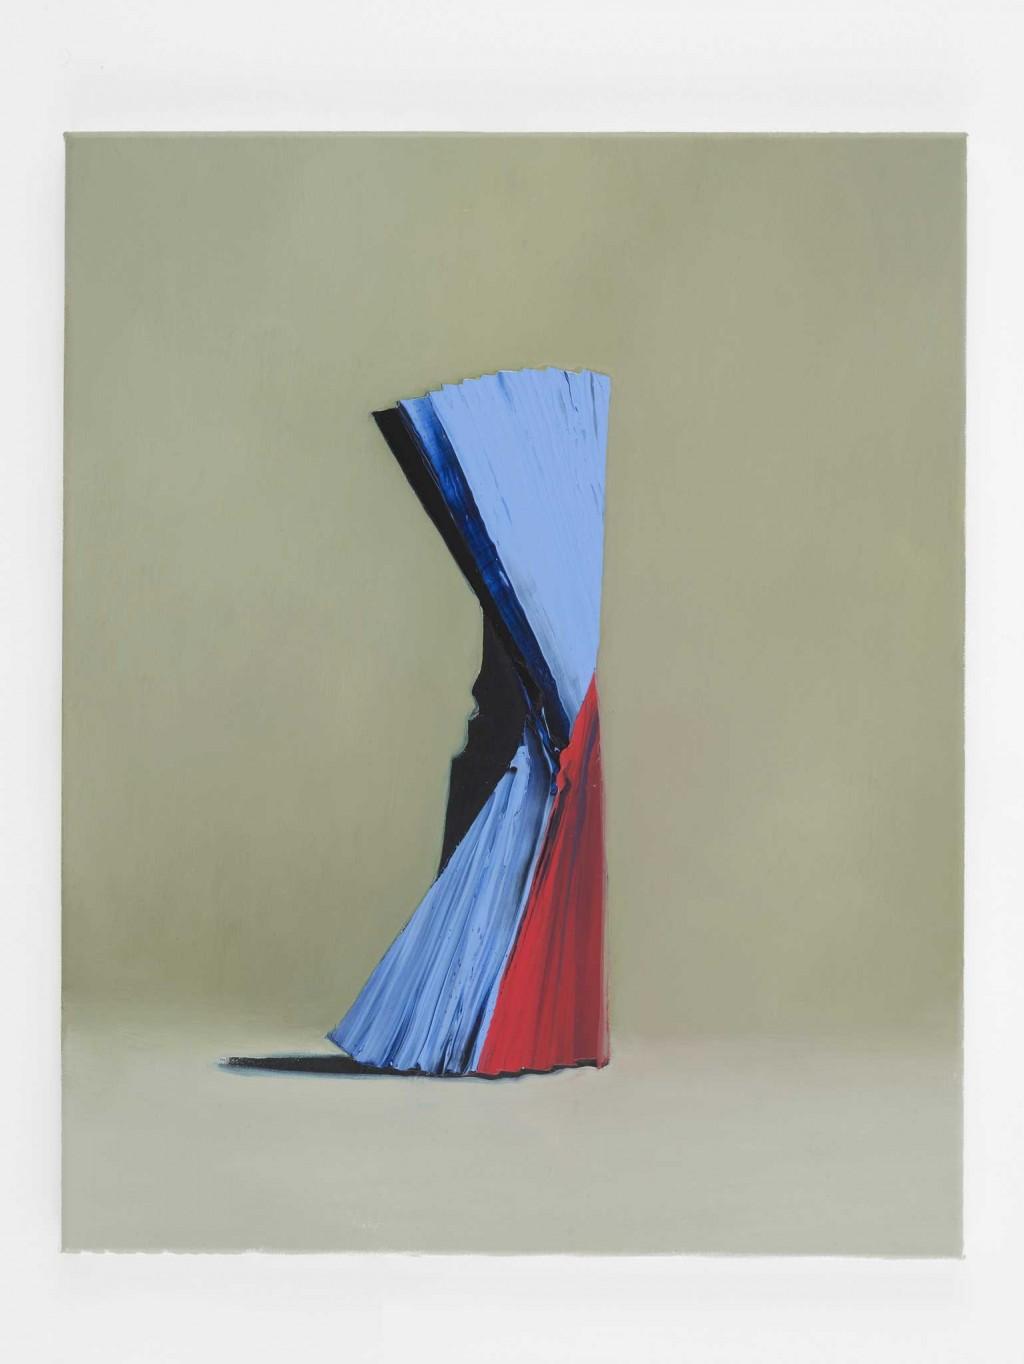 Carl freedman gallery intent blacks this 2015 oil on canvas 70 57 cm jeuxipadfo Gallery